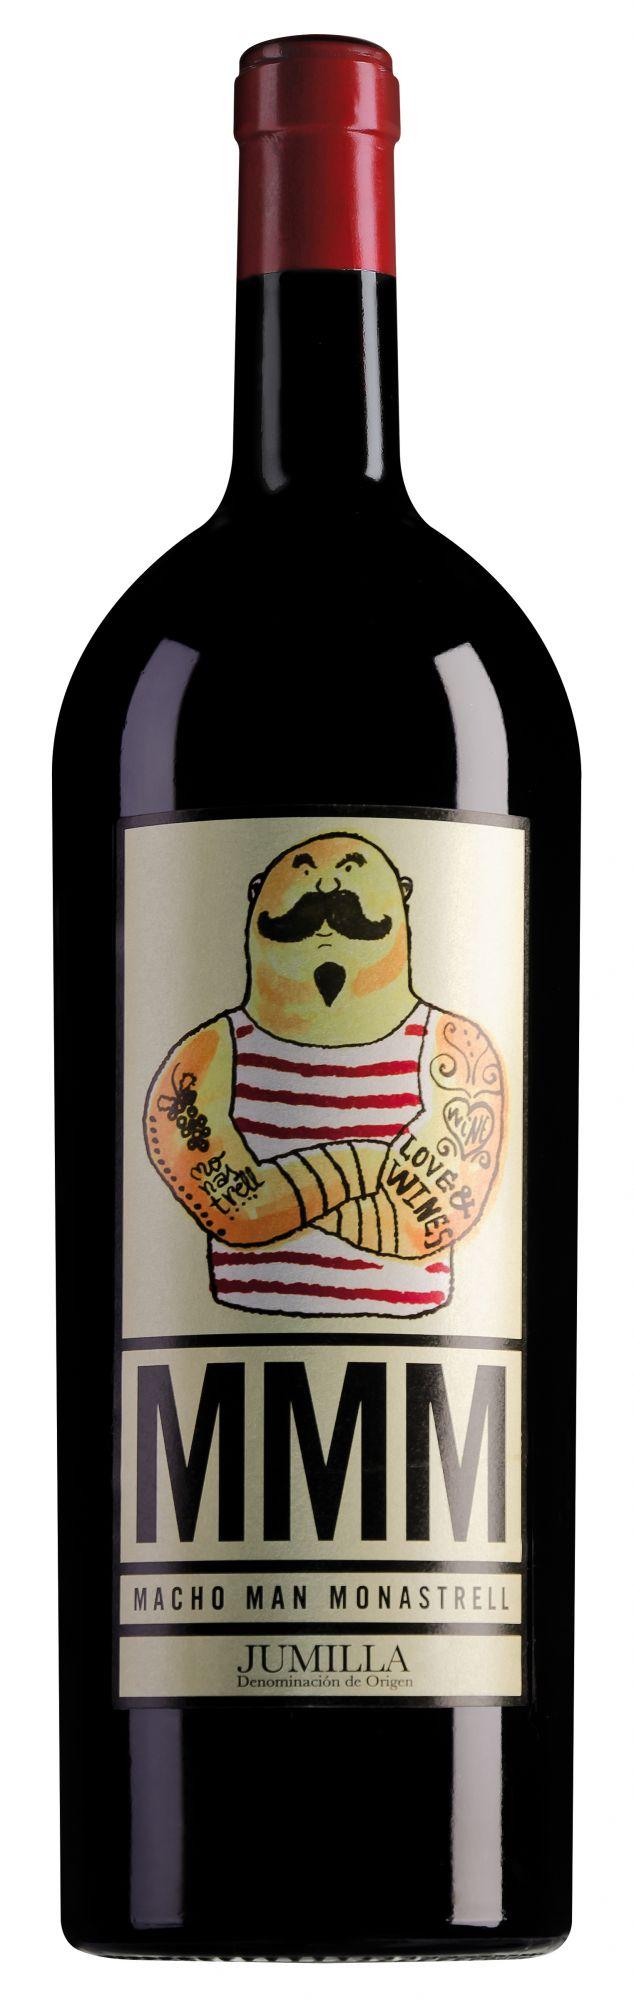 Wine Guru Jumilla Macho Man Monastrell magnum